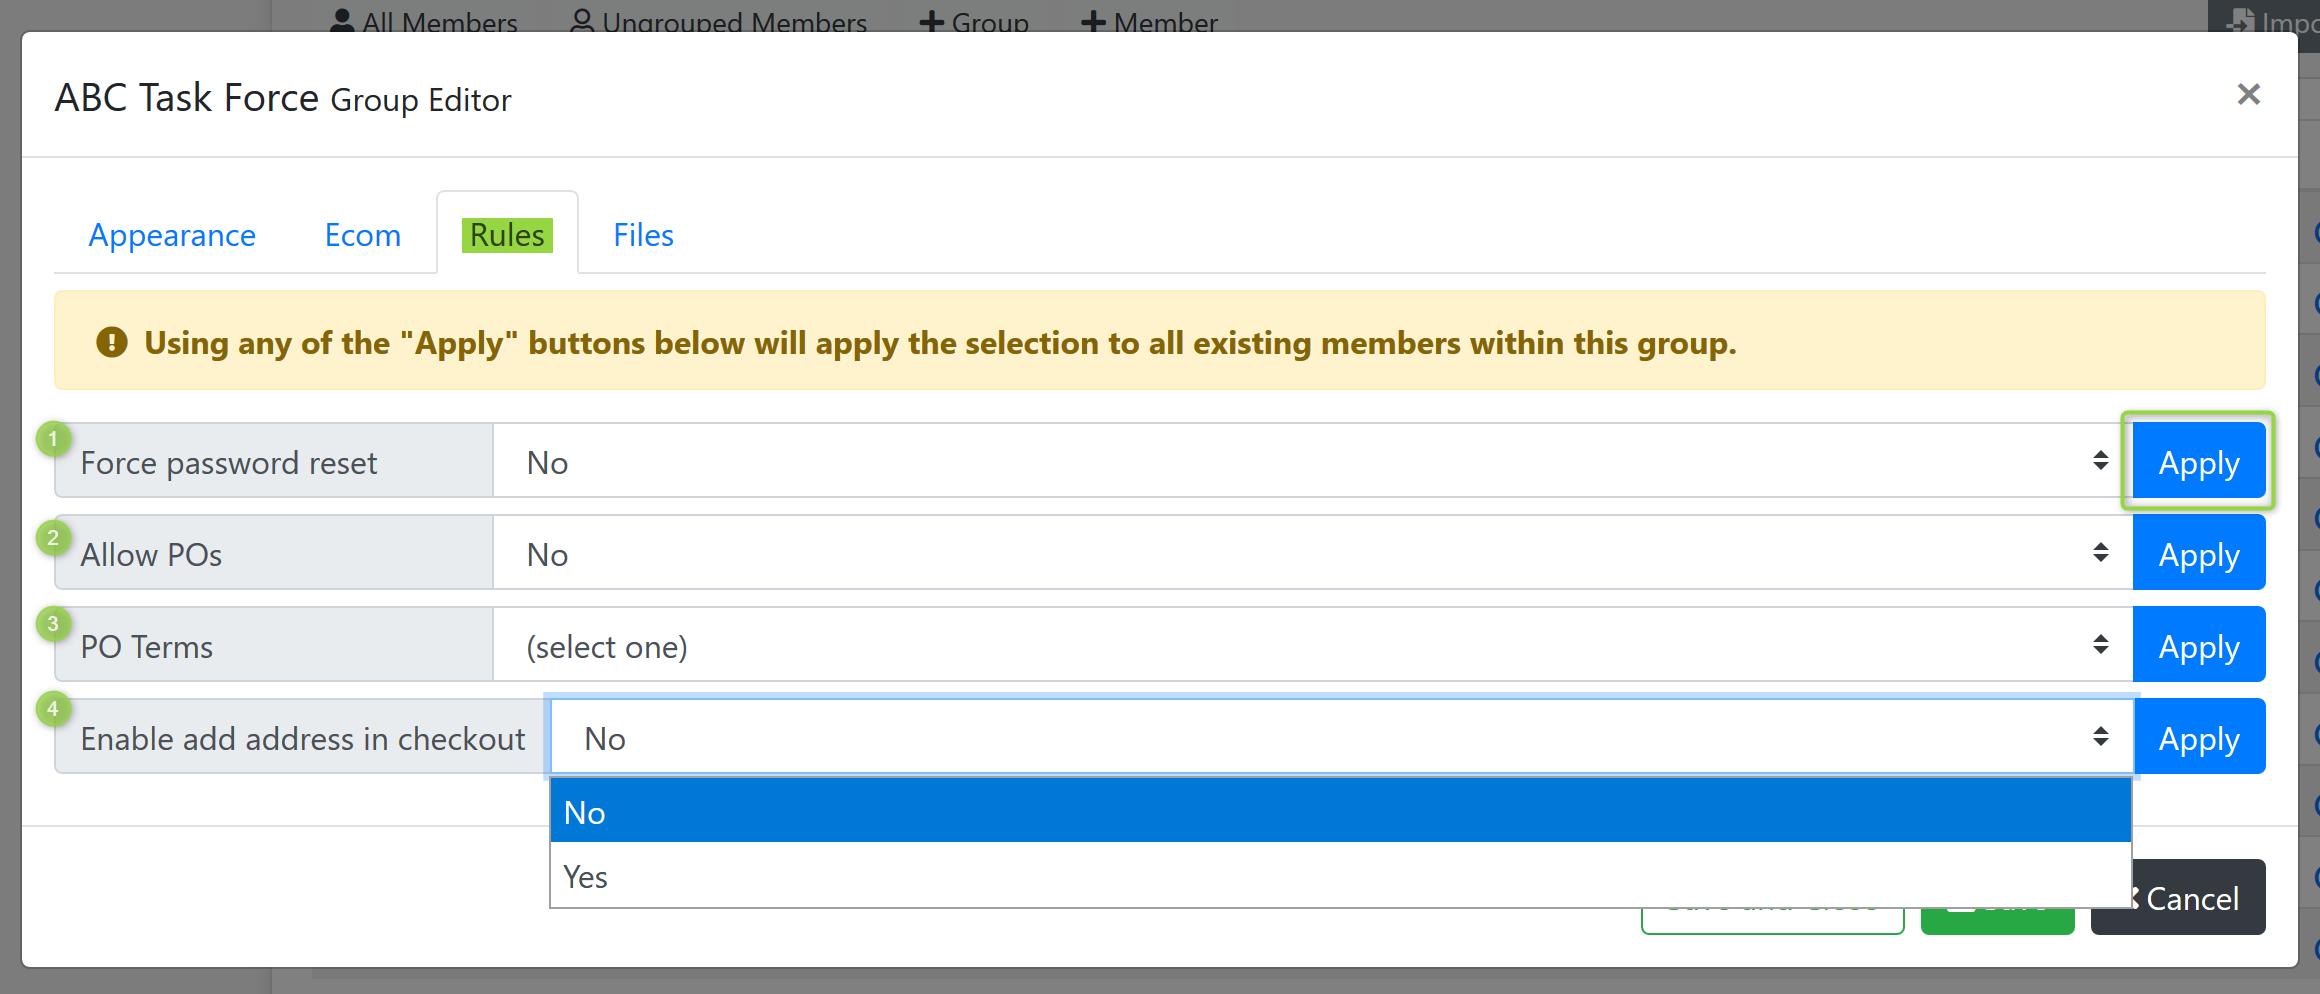 Group Editor Rules Screenshot